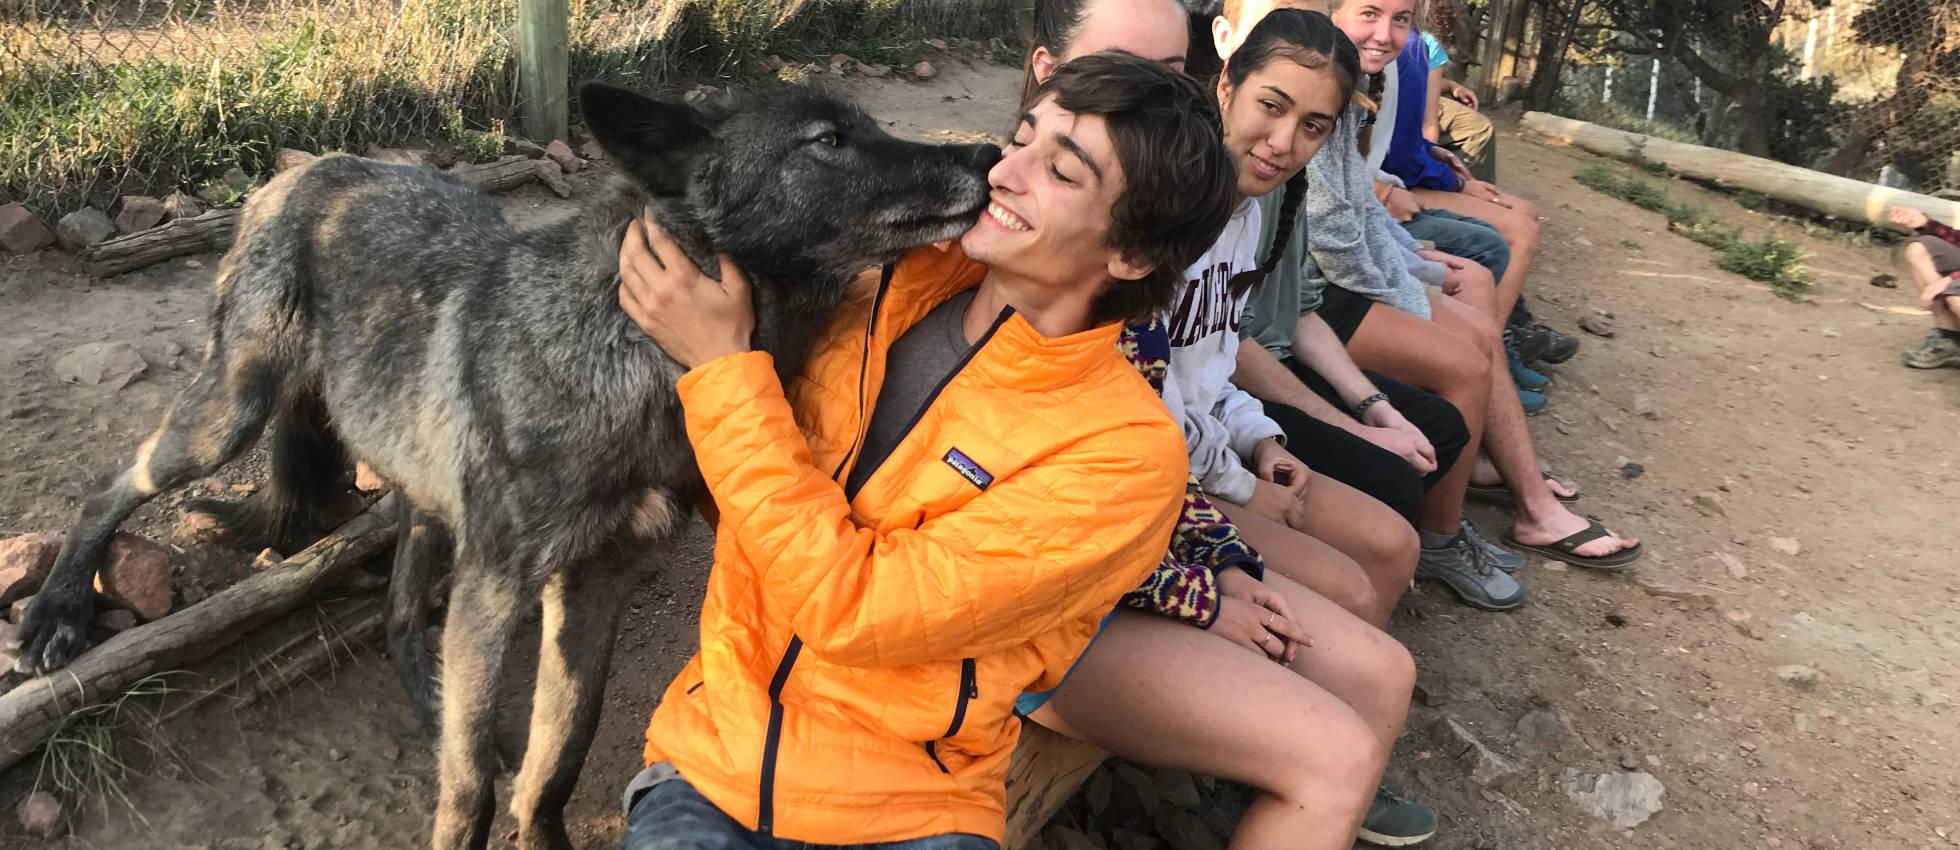 Summer Program - Animals/Nature | ARCC Programs | Colorado & Utah: Canyons & Conservation